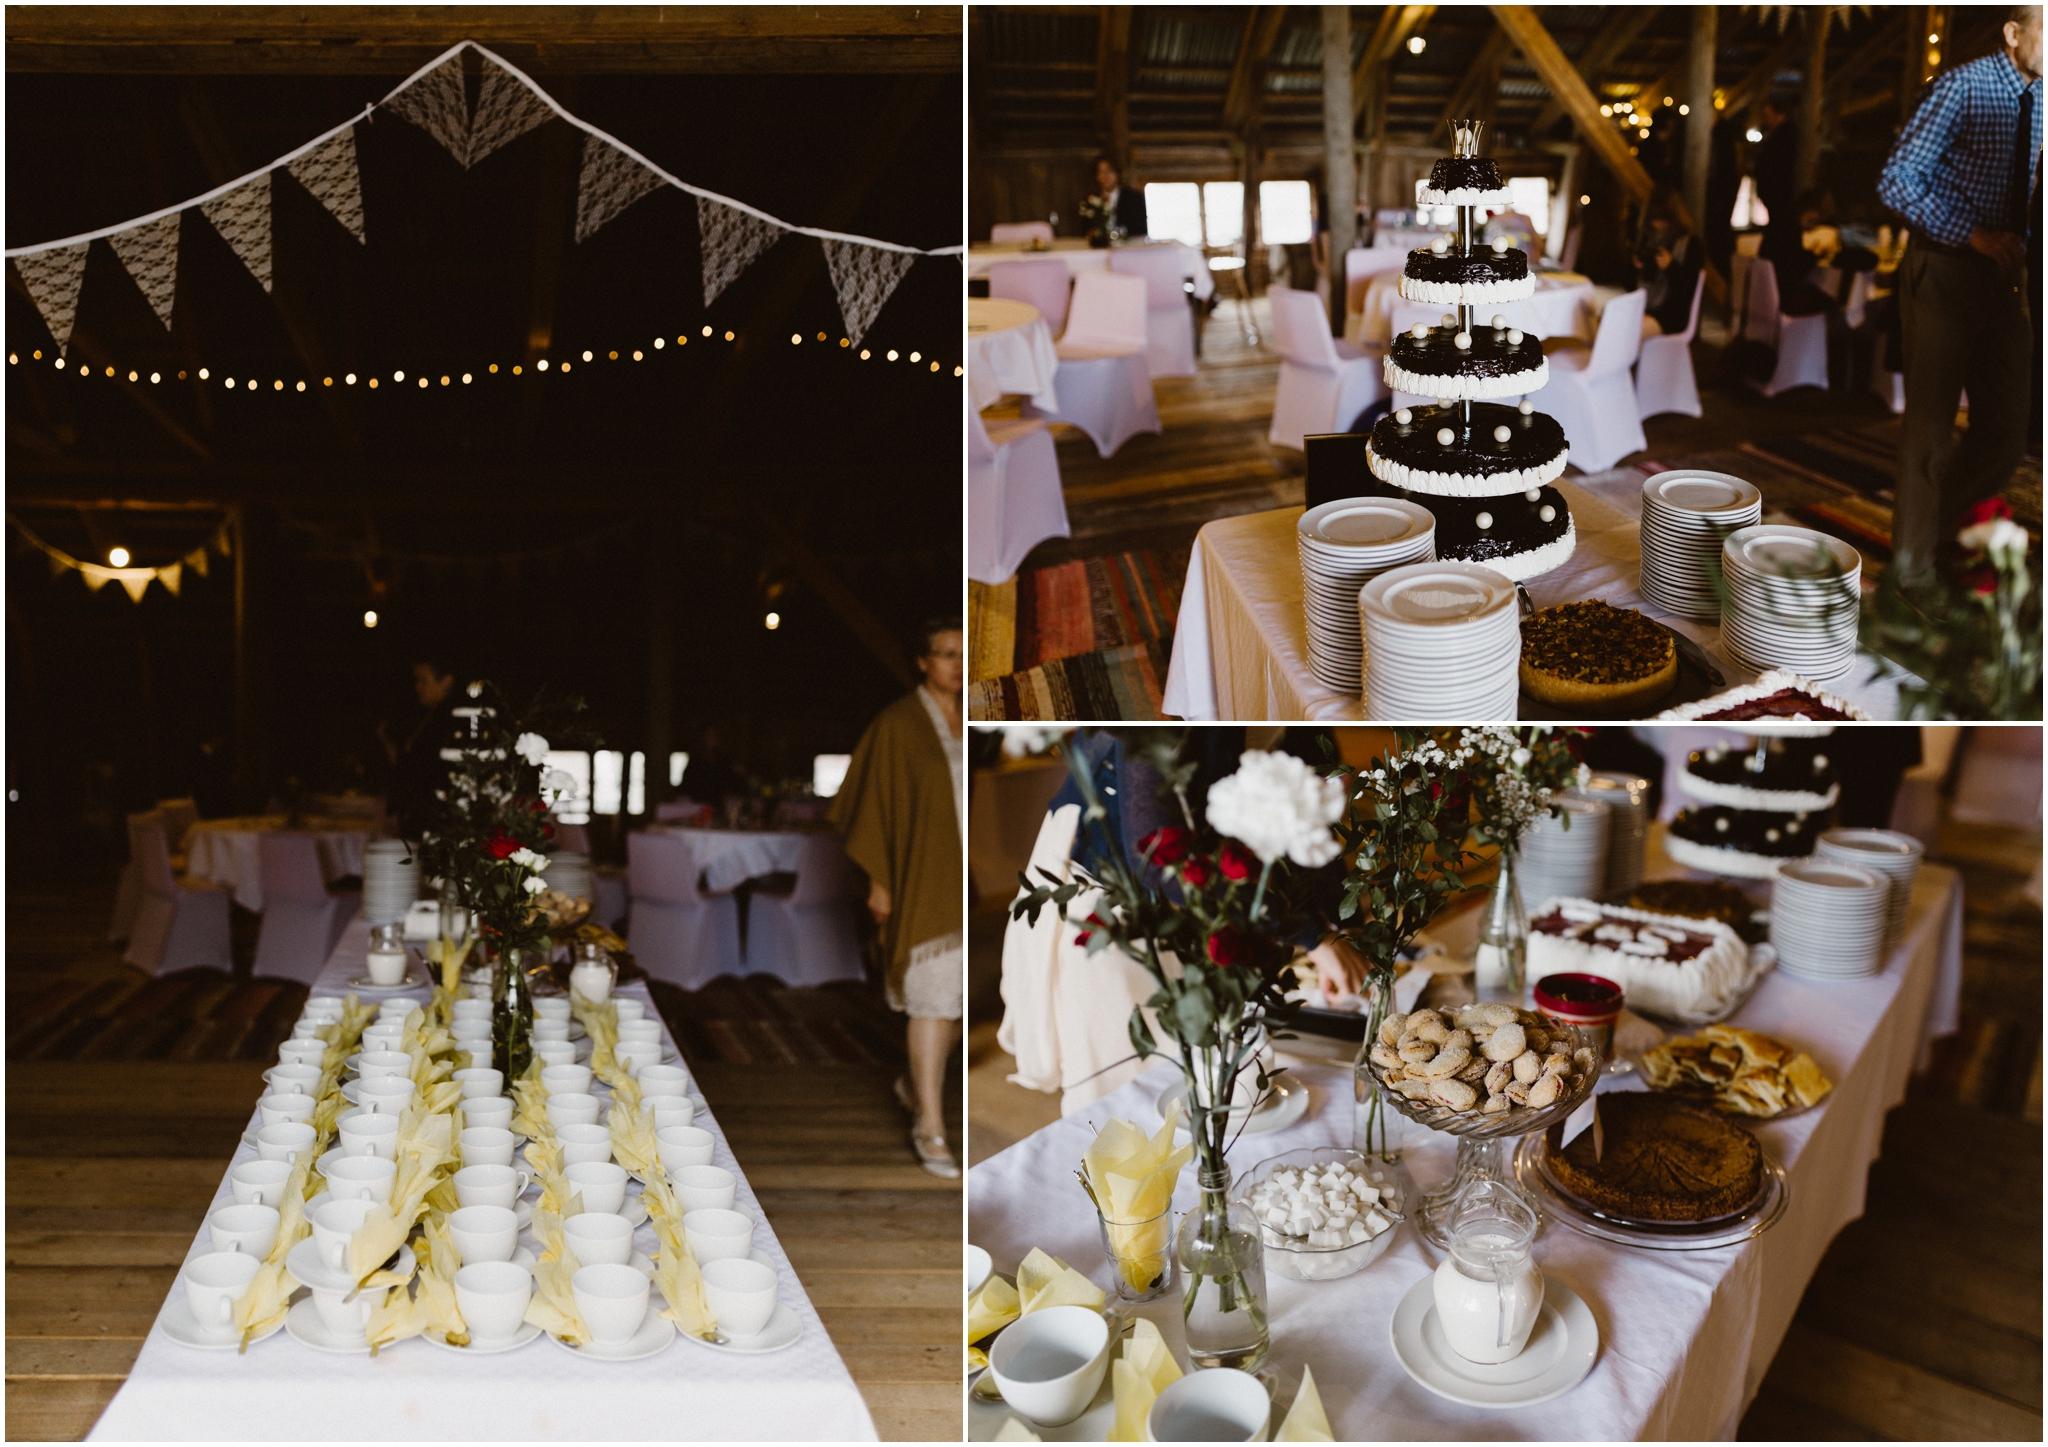 Leevi + Susanna -- Patrick Karkkolainen Wedding Photographer + Adventurer-190.jpg